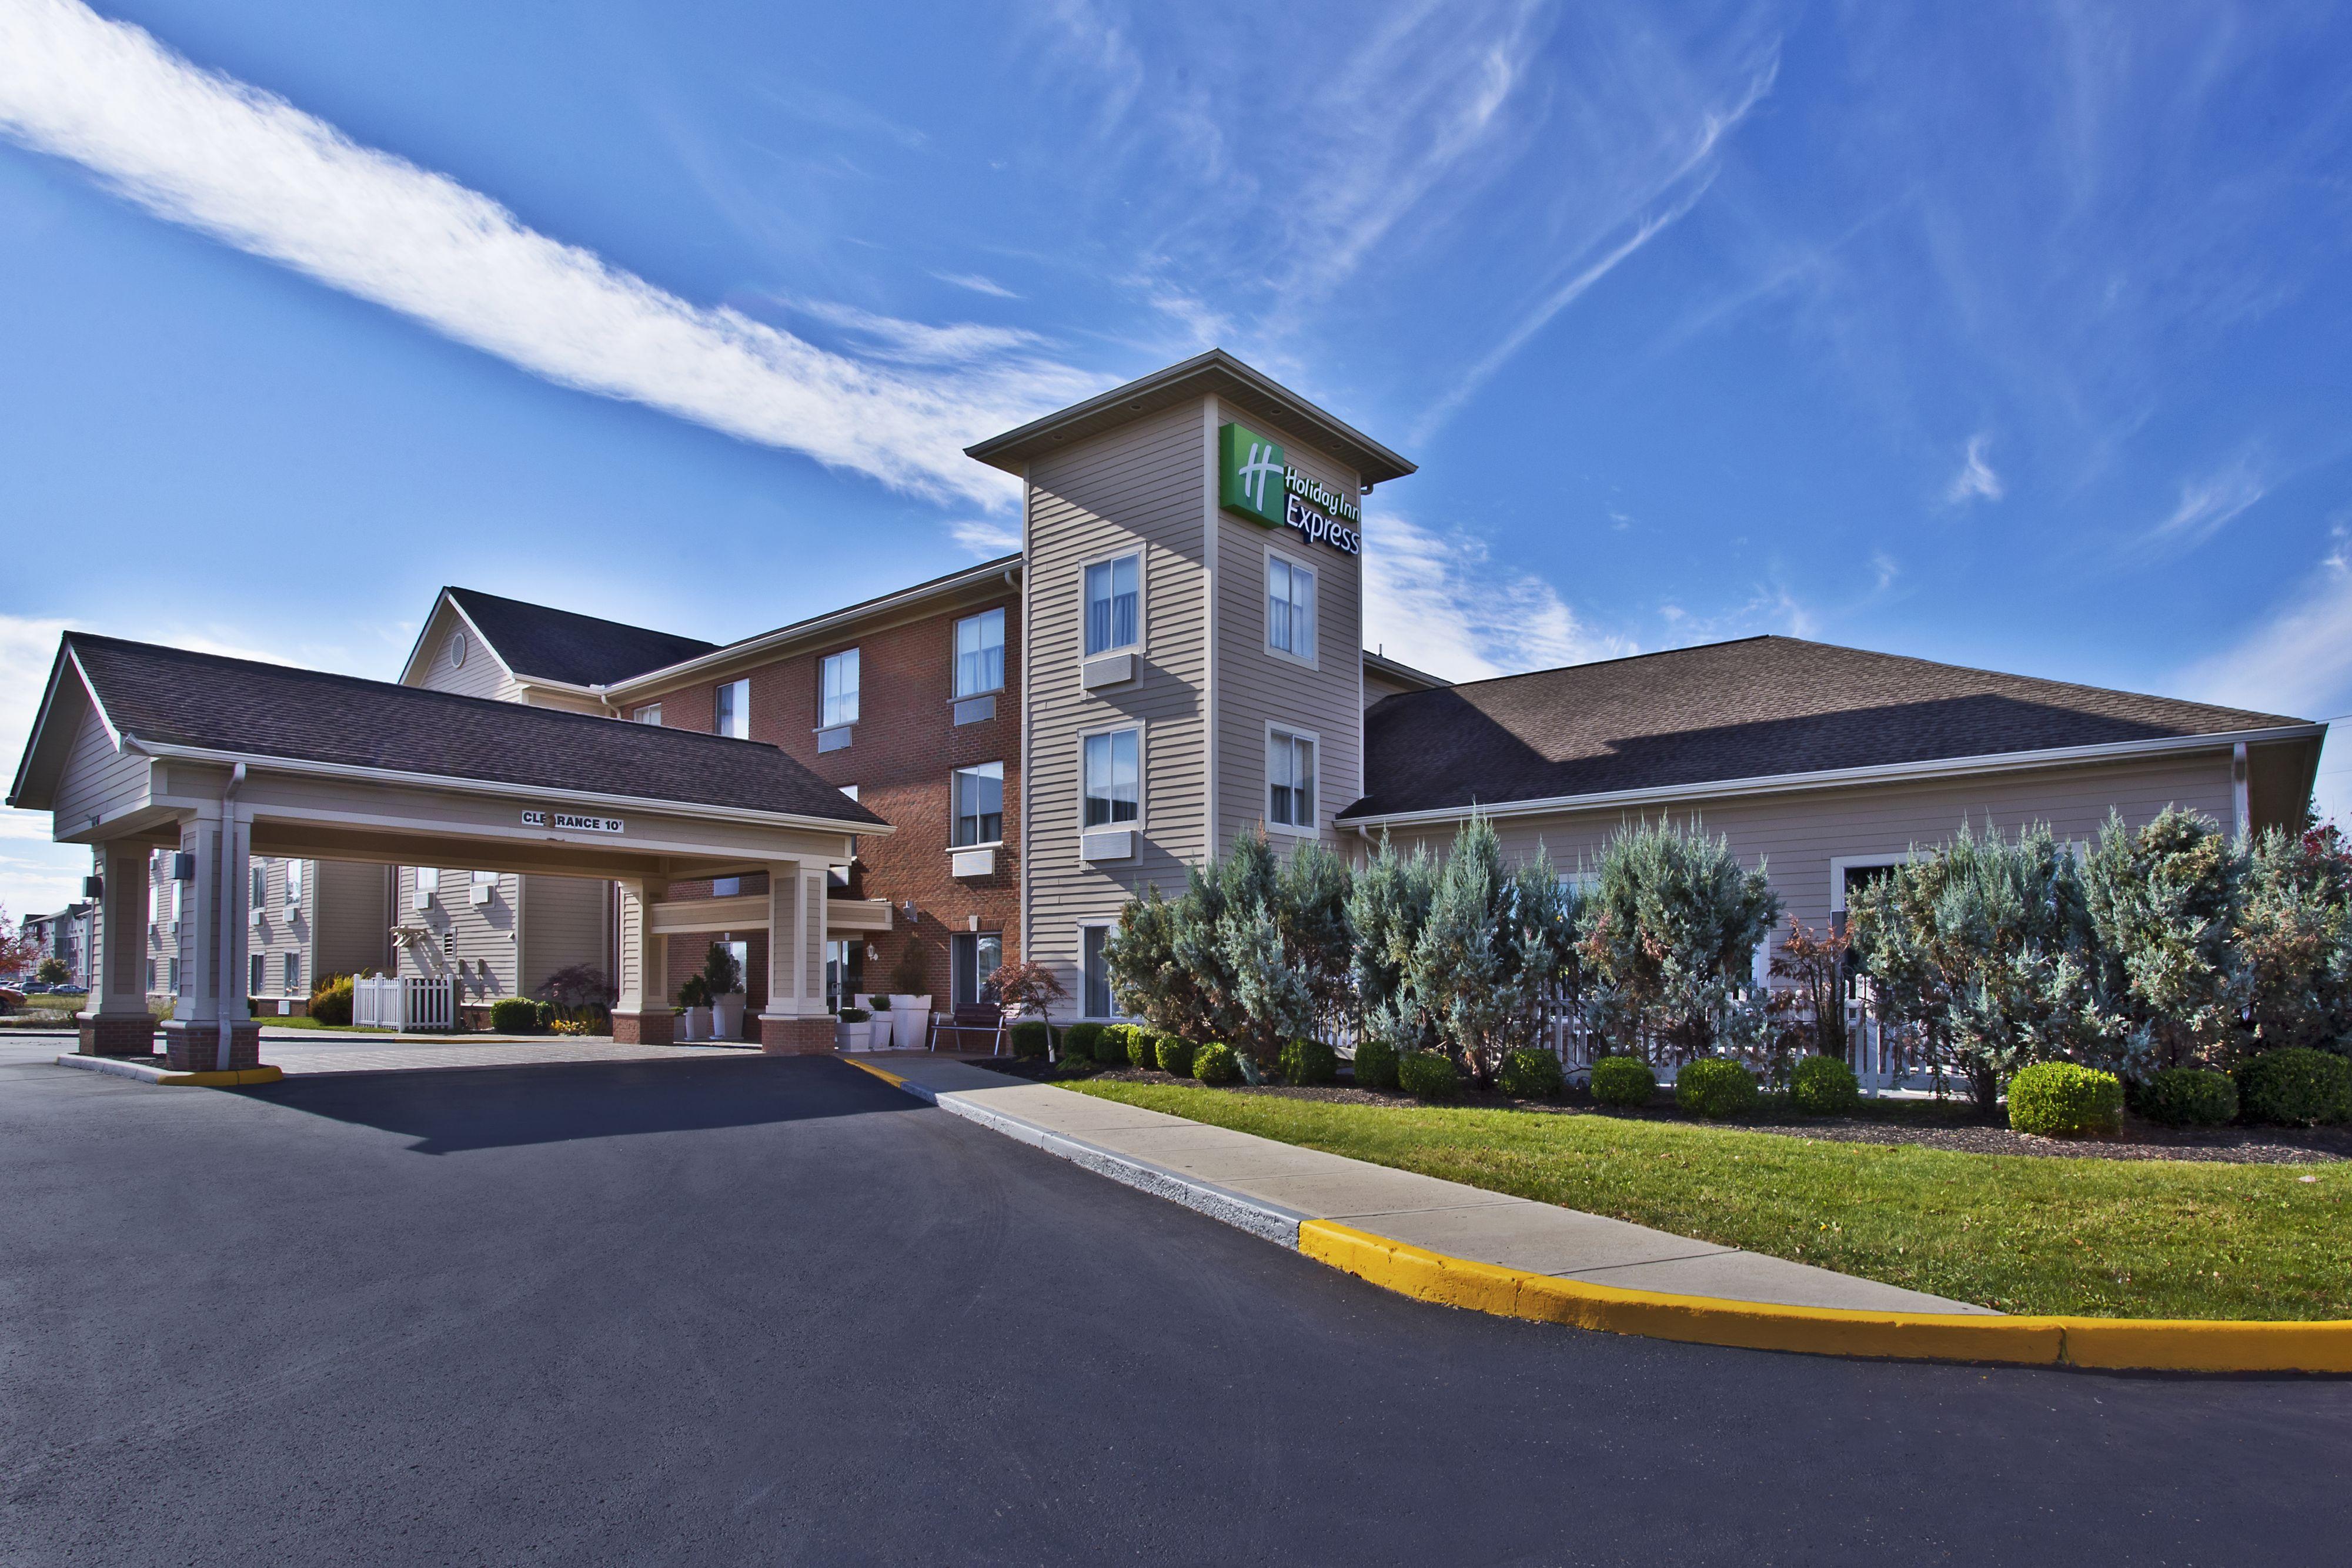 Holiday Inn Express Suites Columbus East Reynoldsburg In Reynoldsburg Oh Whitepages